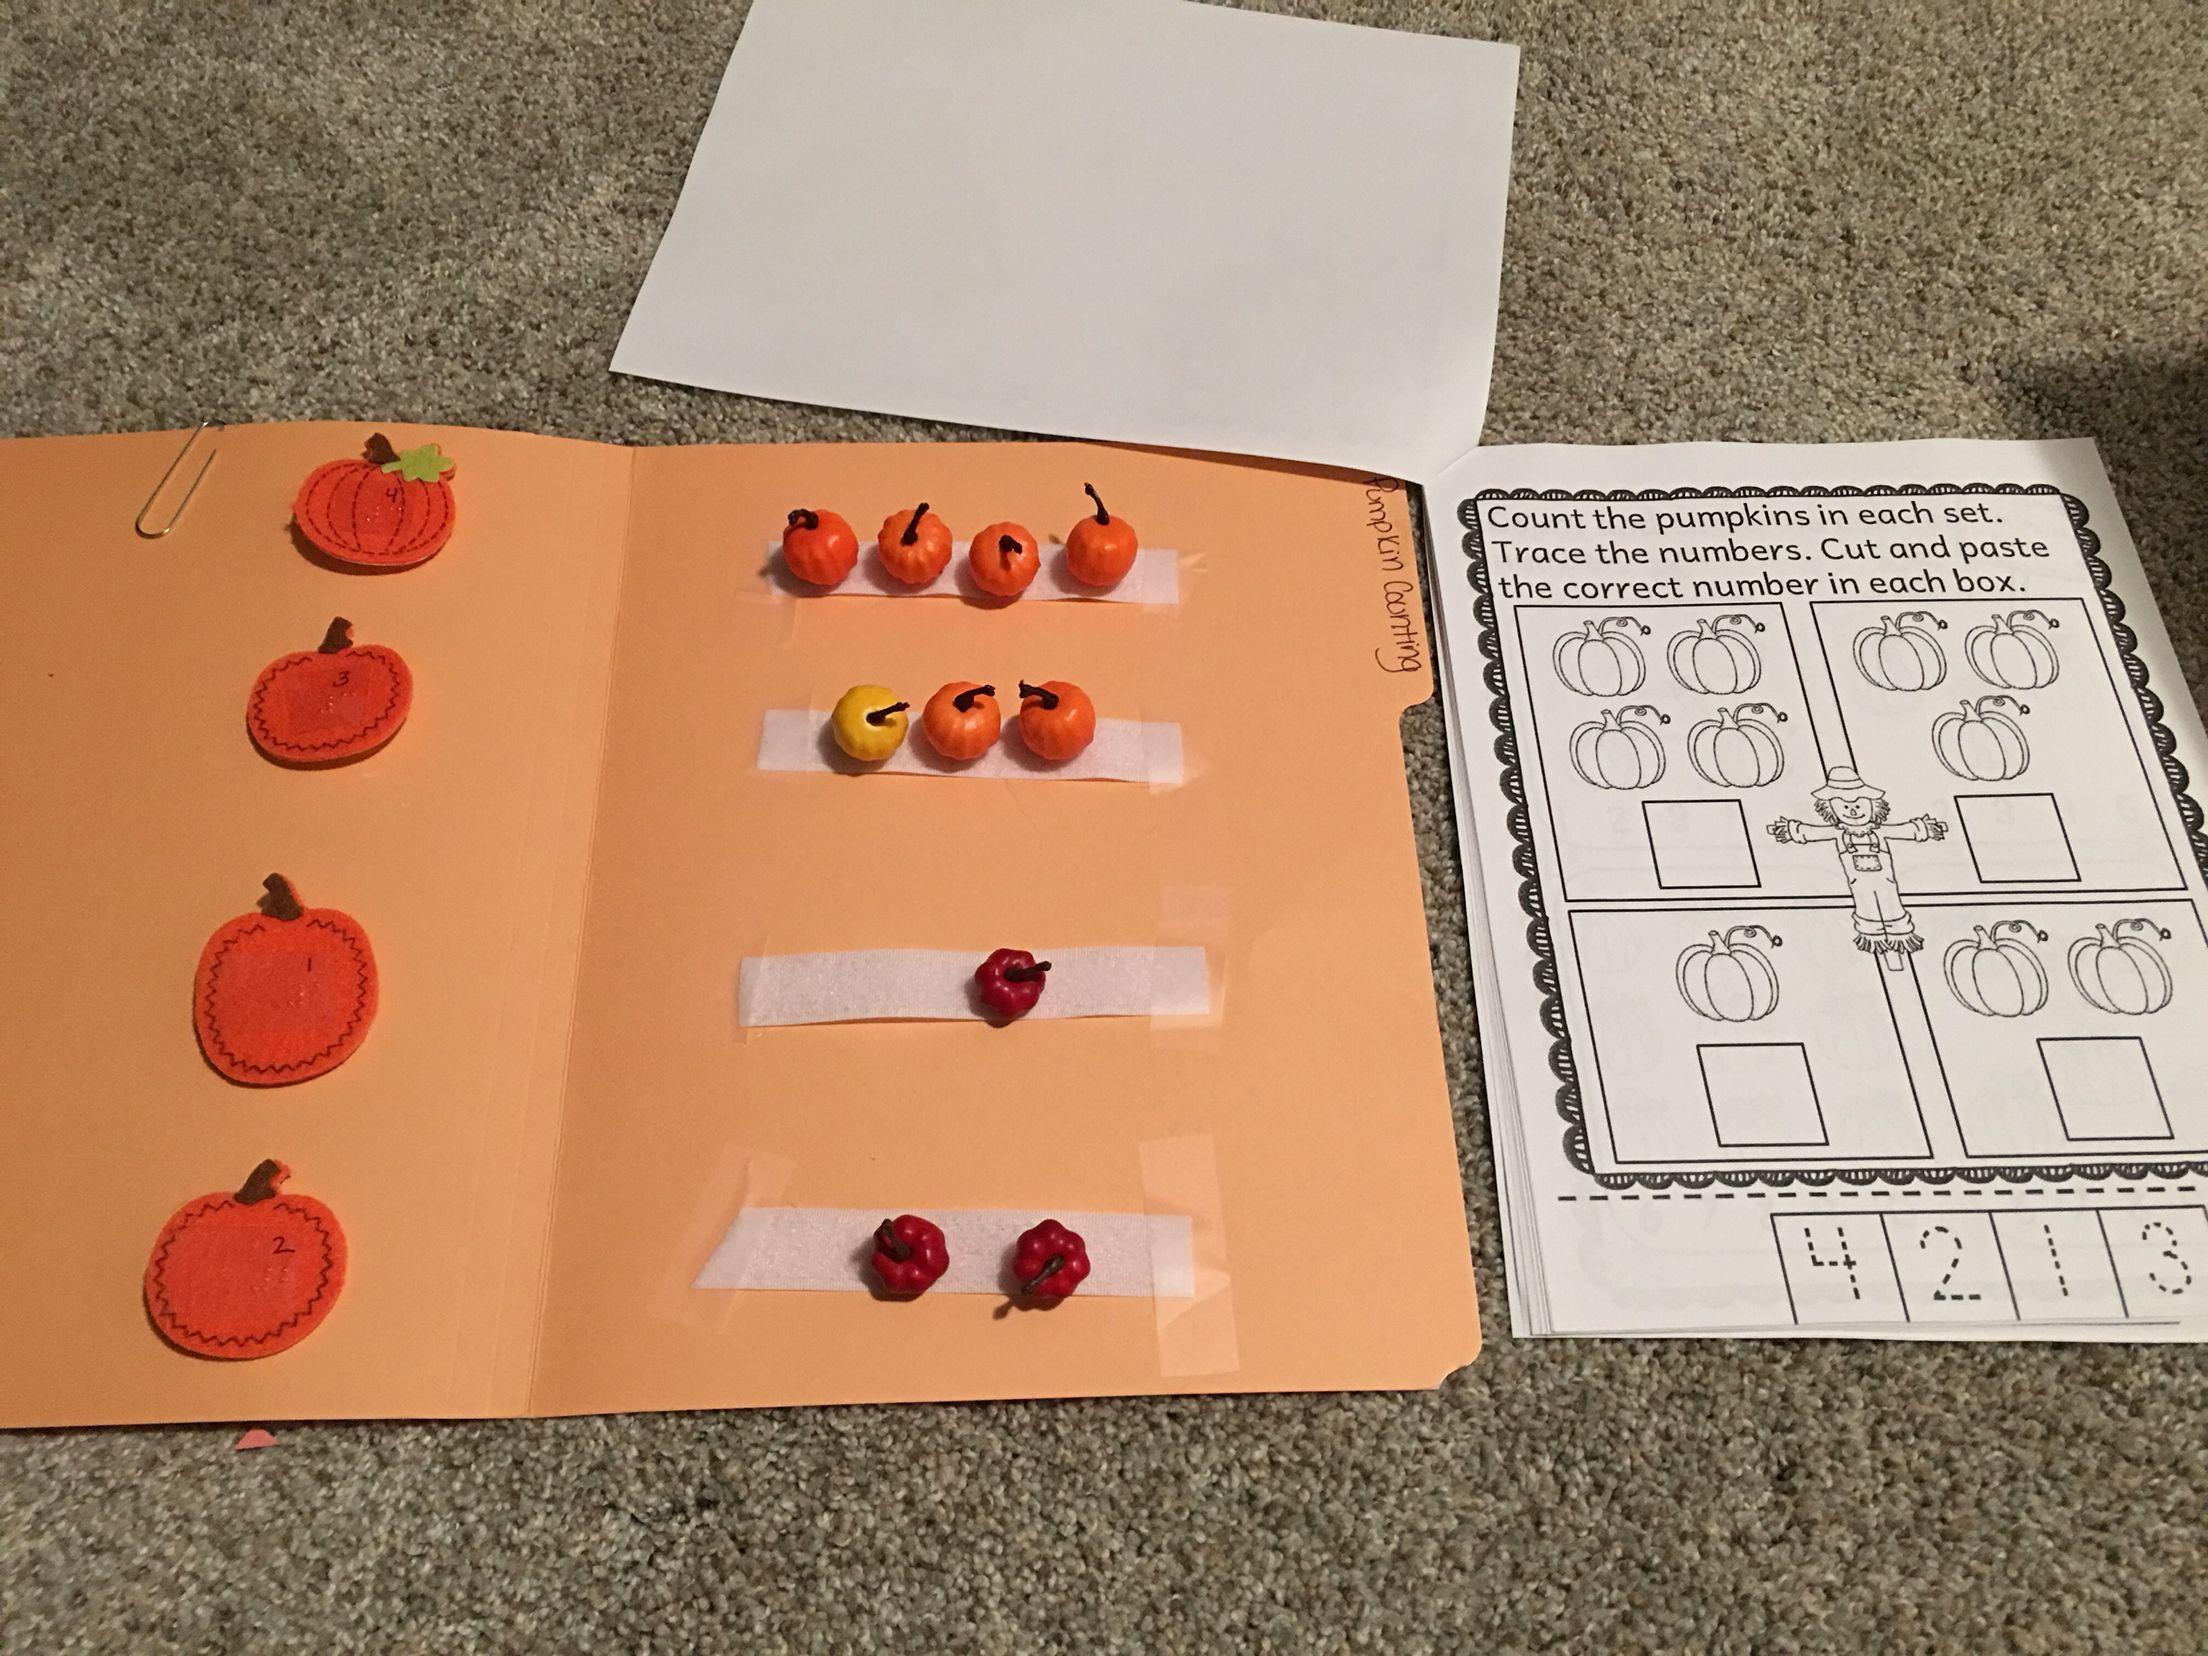 September Pumpkin Braille Counting To Mirror Worksheet